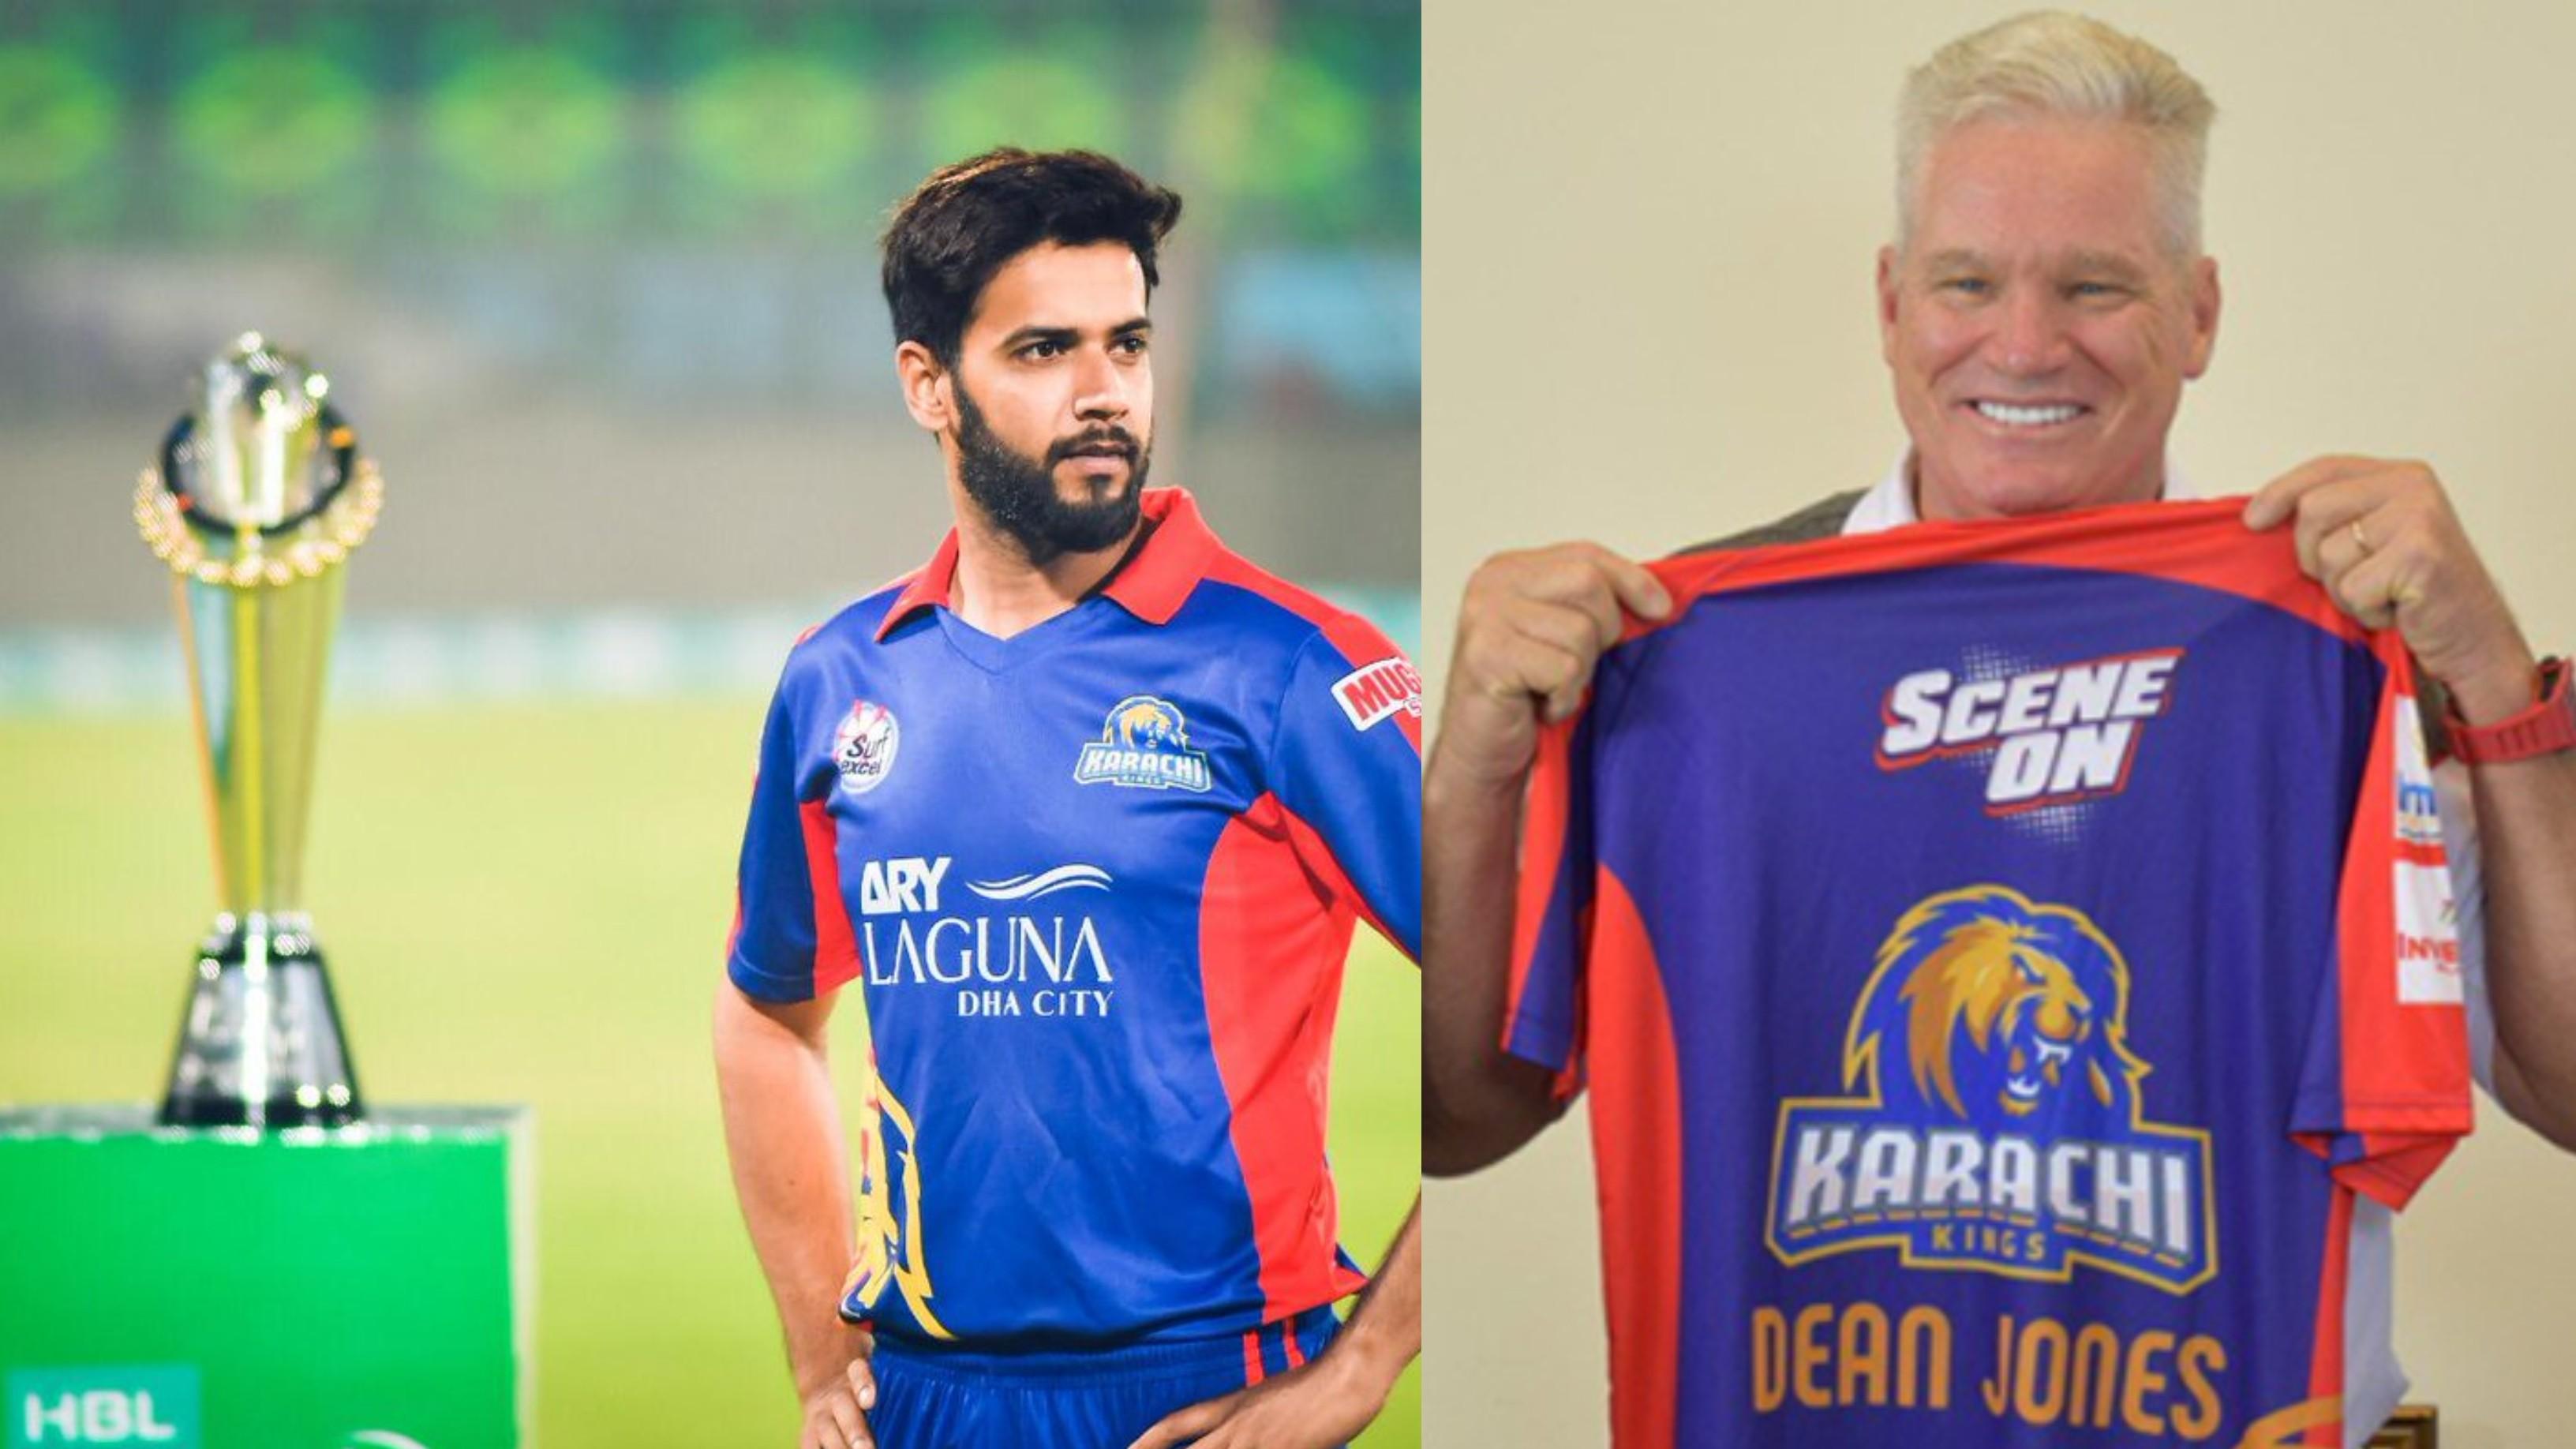 PSL 2020: Imad Wasim hails Dean Jones' contribution after Karachi Kings win maiden PSL title